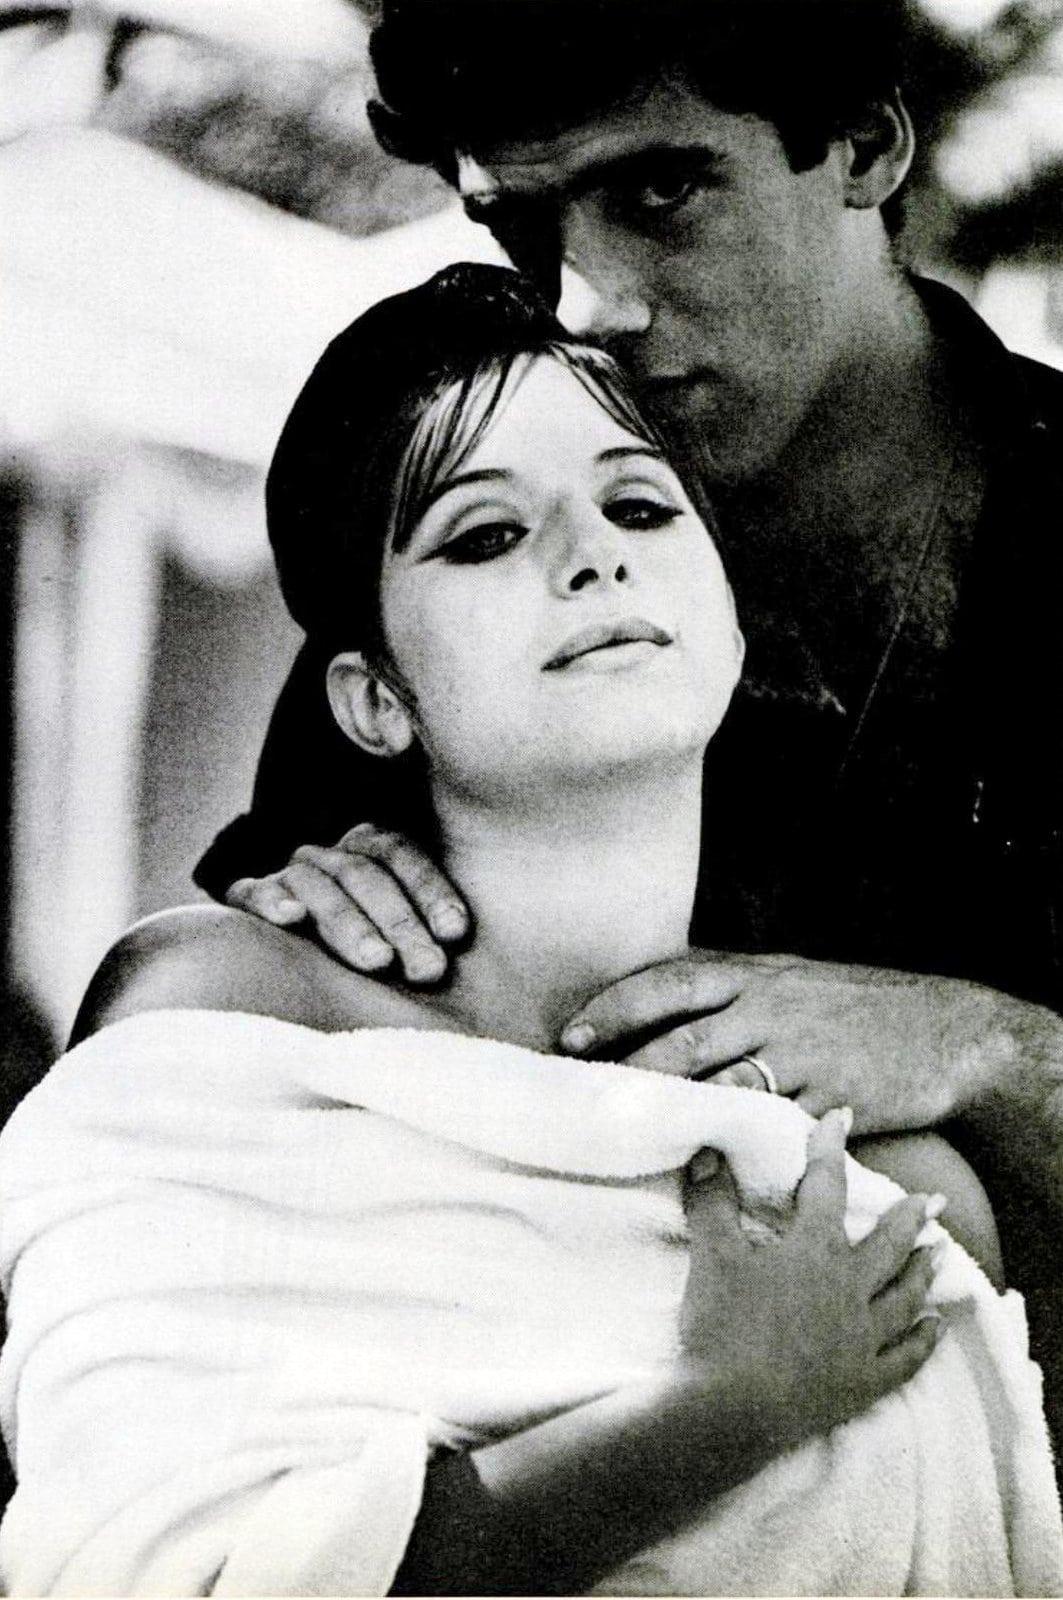 Barbra Streisand and Elliot Gould (1964)